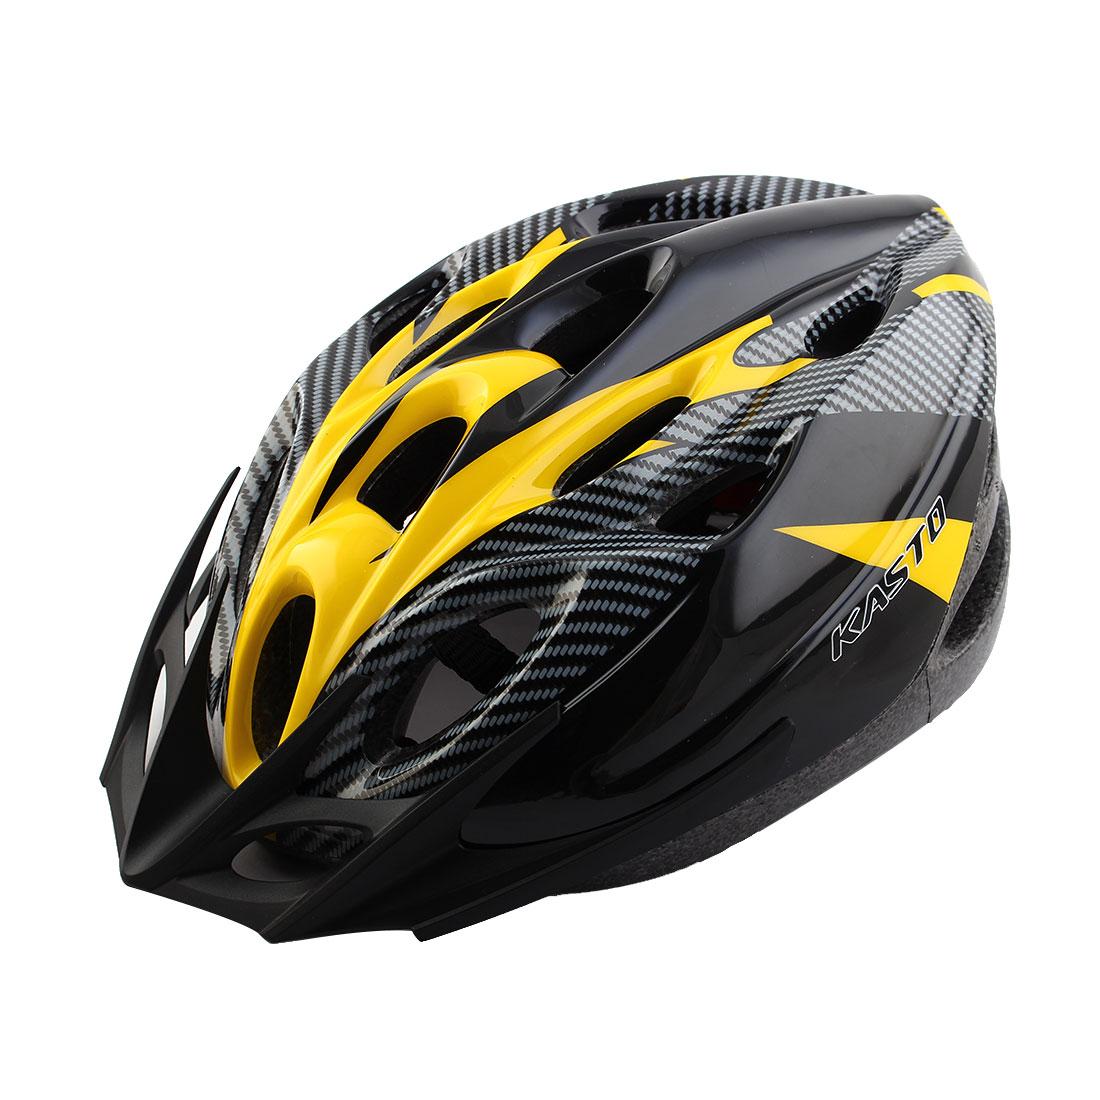 Unisex 18 Holes LED Light Removable Visor Outdoor Sports Cap Portable Hat Adjustable Safety Bicycle Bike Helmet